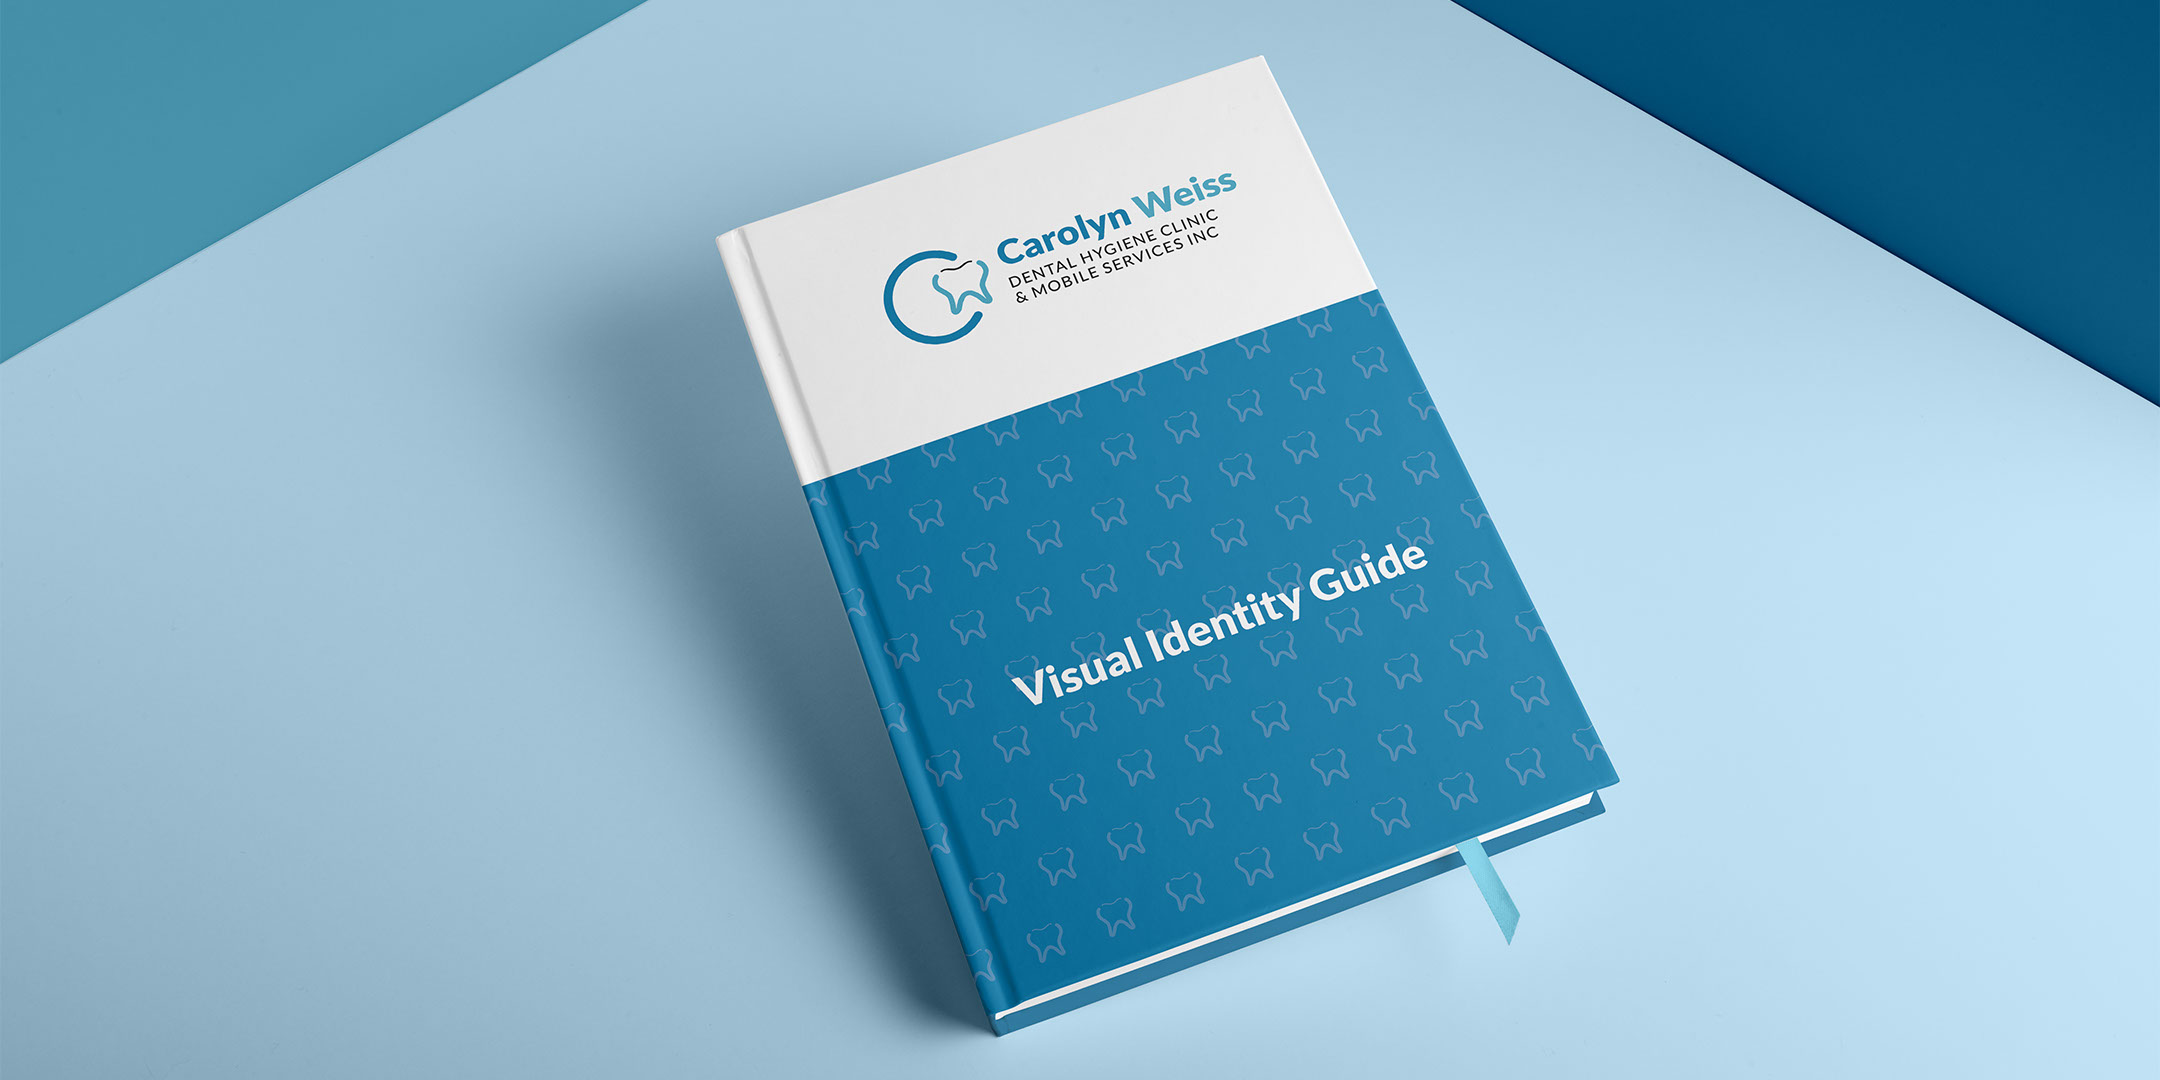 Carolyn Weiss identity manual cover